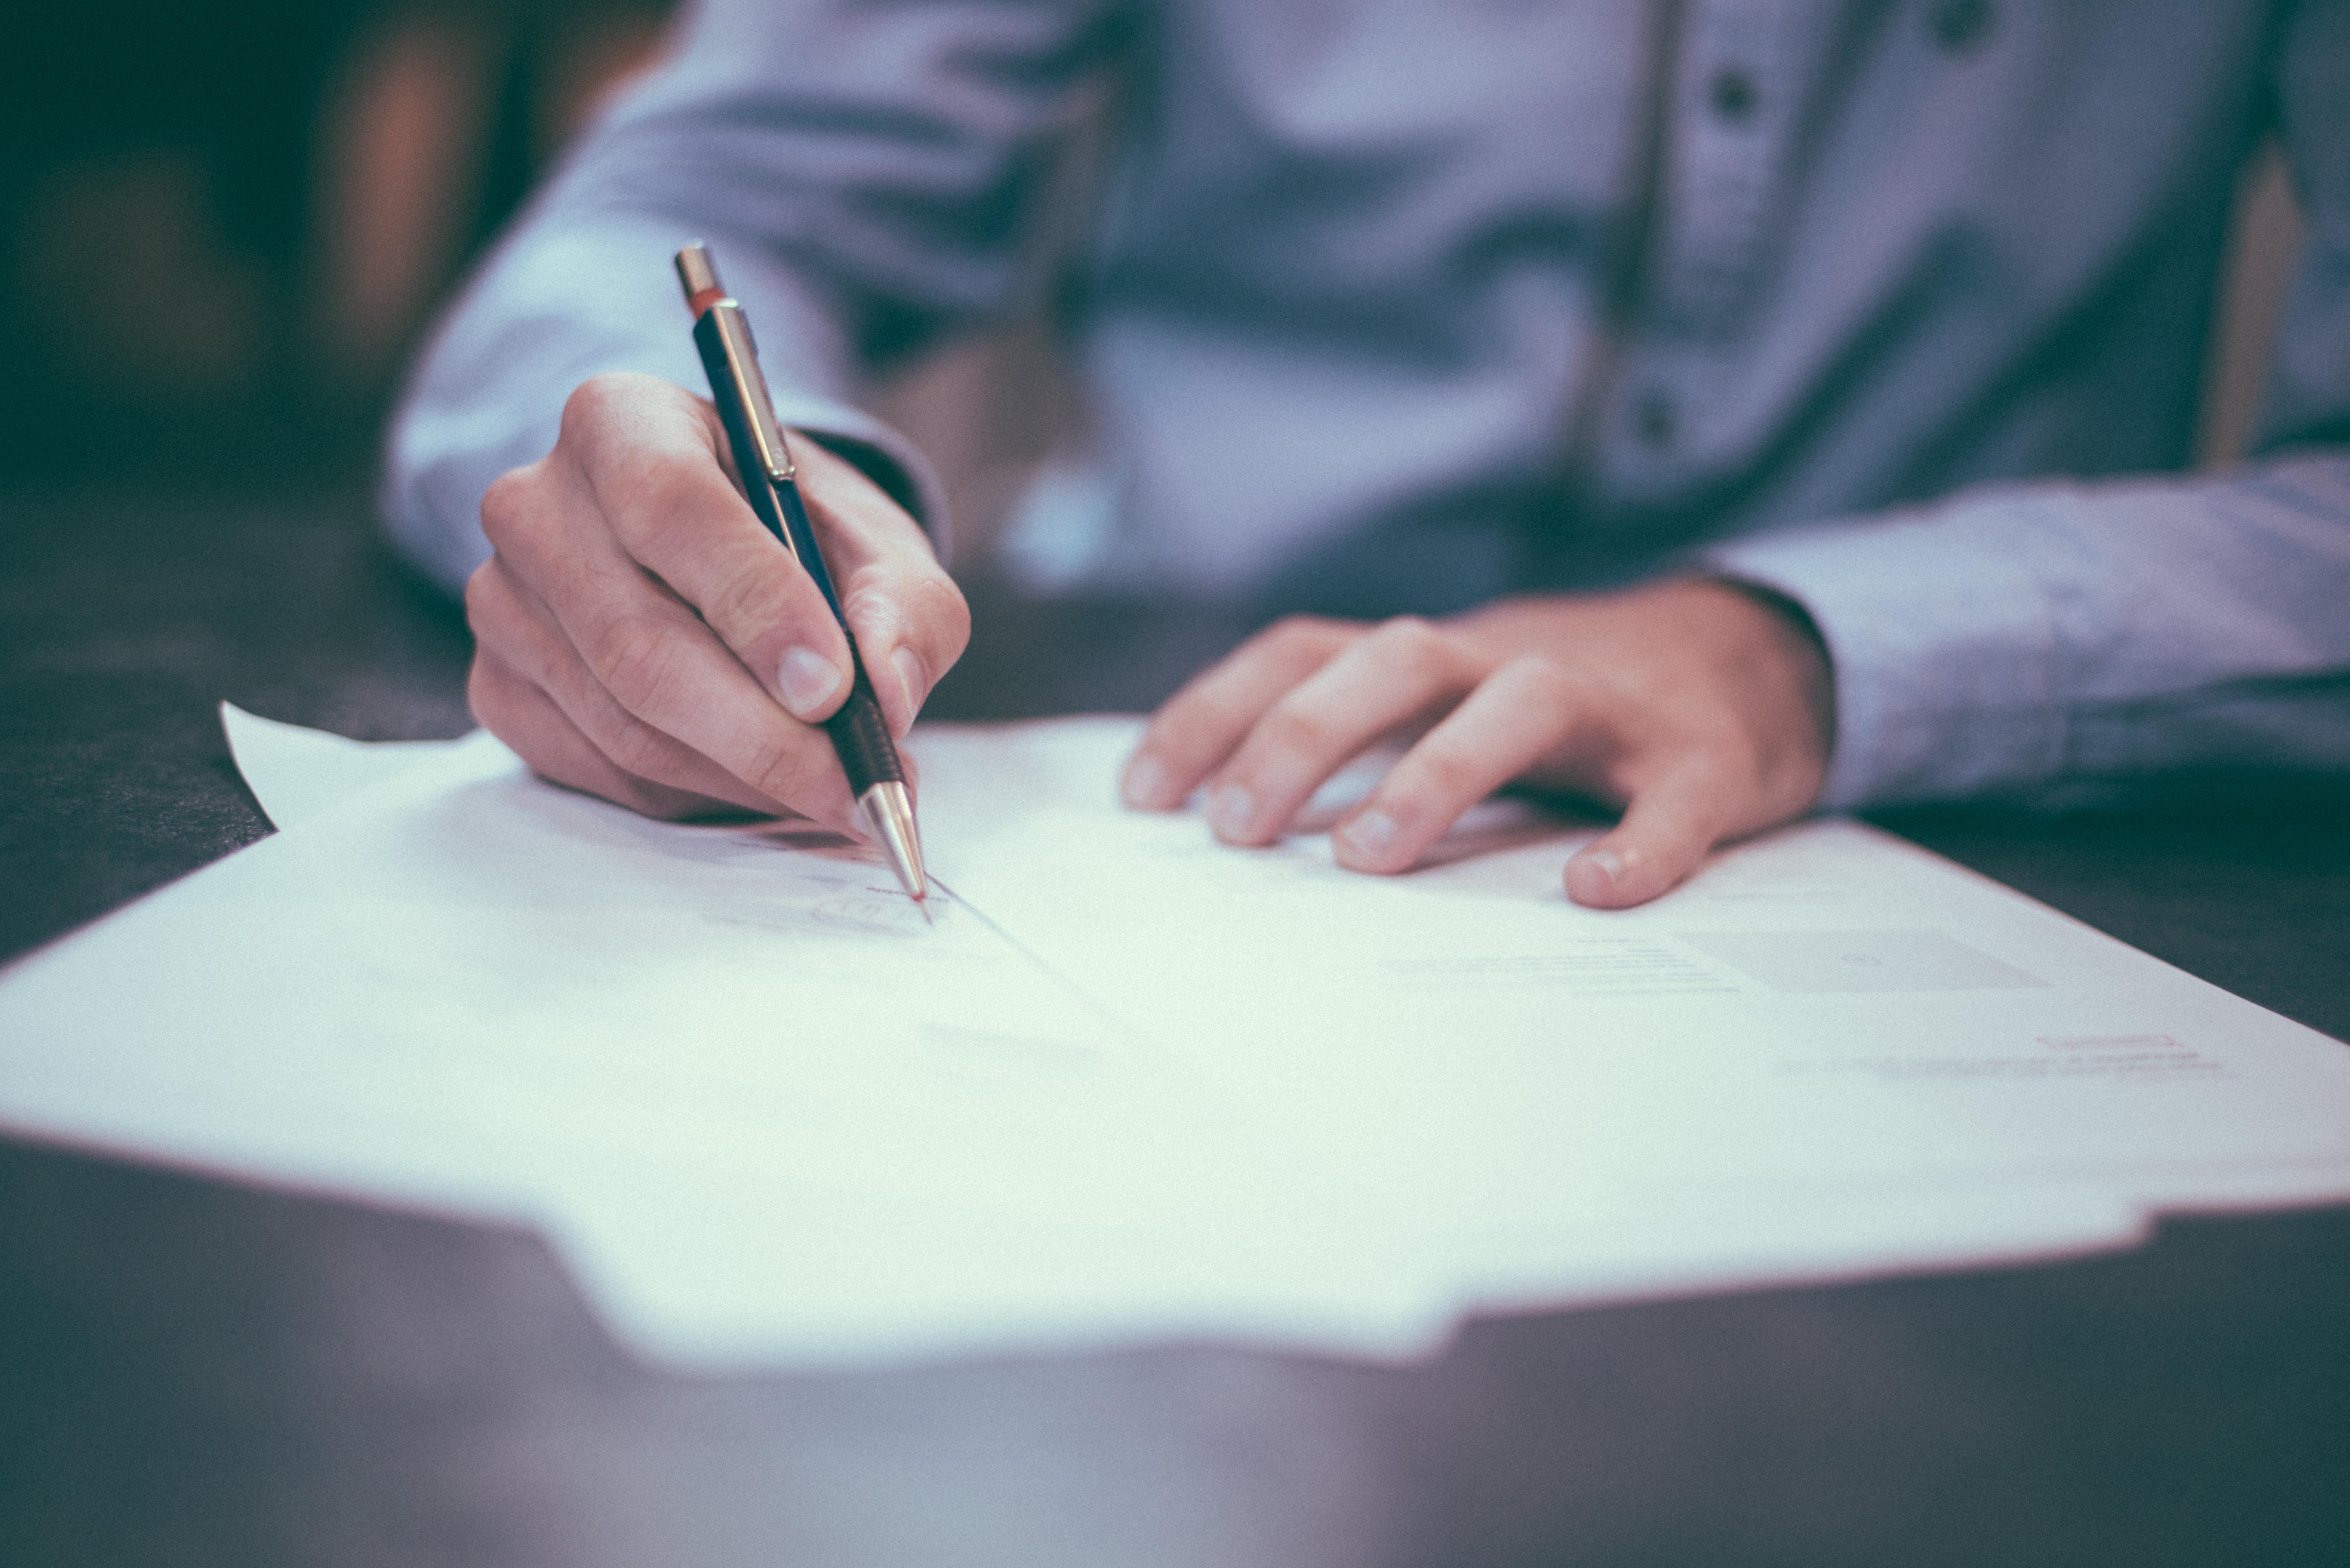 Signature contract new employee